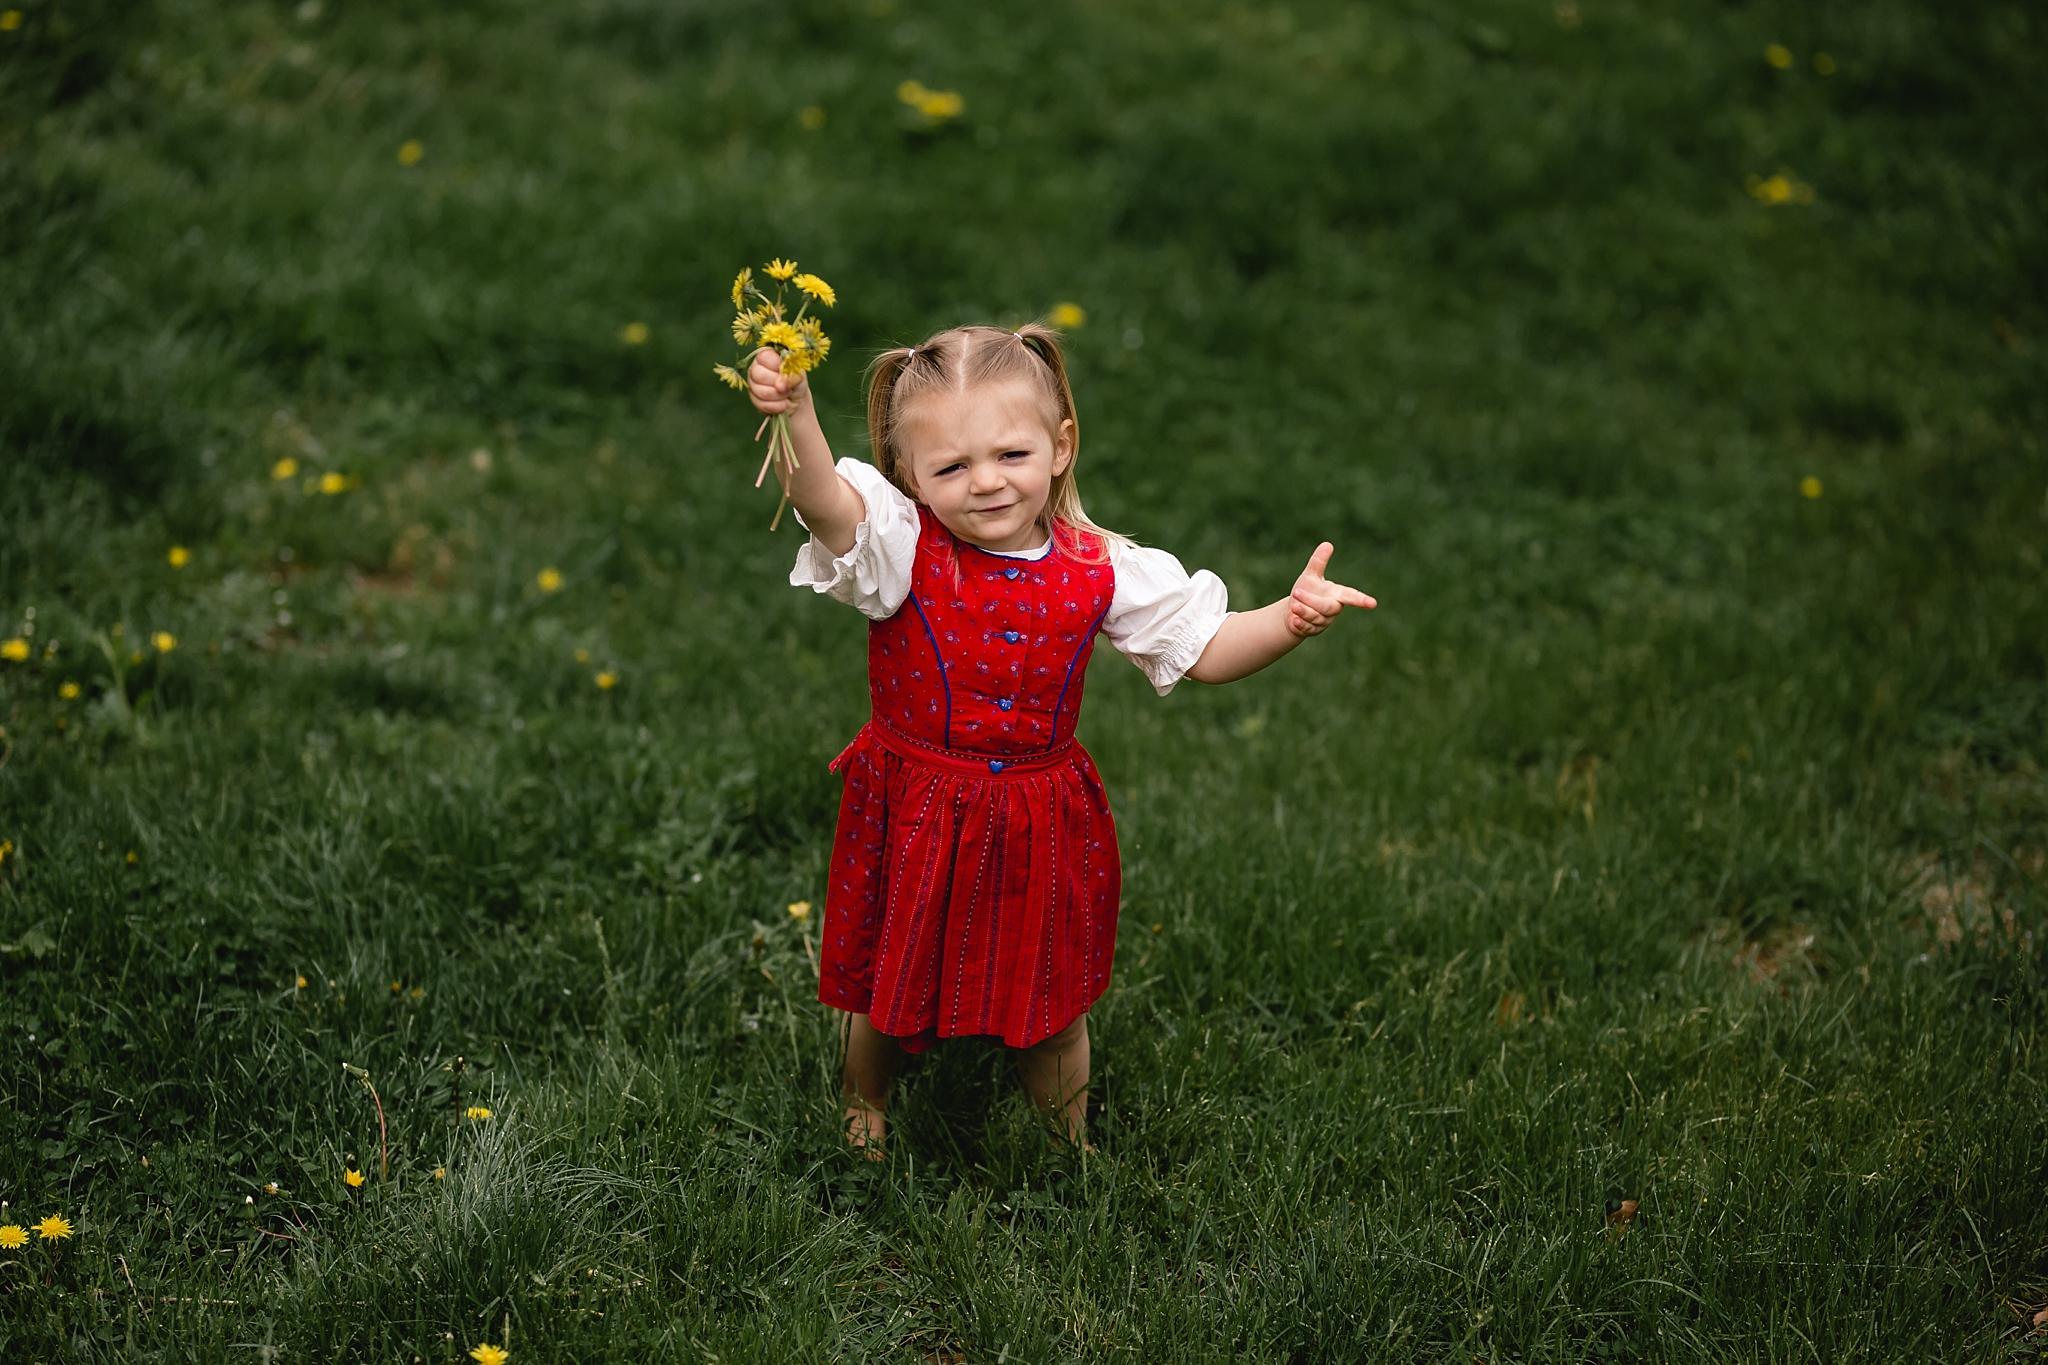 AnneMarie-Hamant-Portraits-and-Stories-Bucks-County-Lehigh-Valley-Photographer